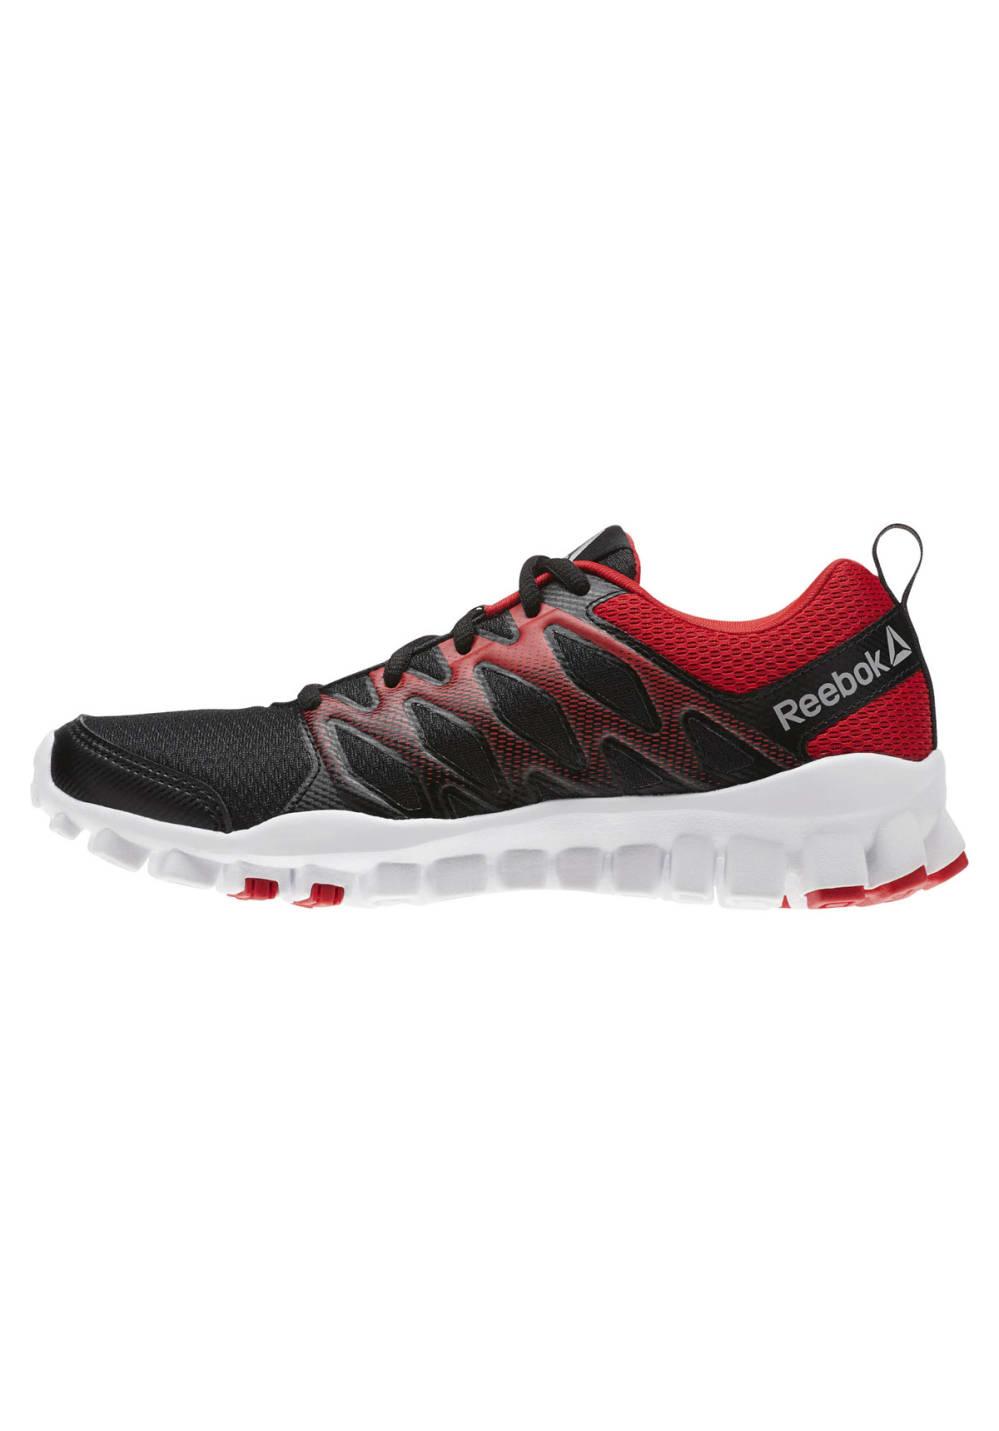 best sneakers b5633 59089 Next. Reebok. Realflex ...